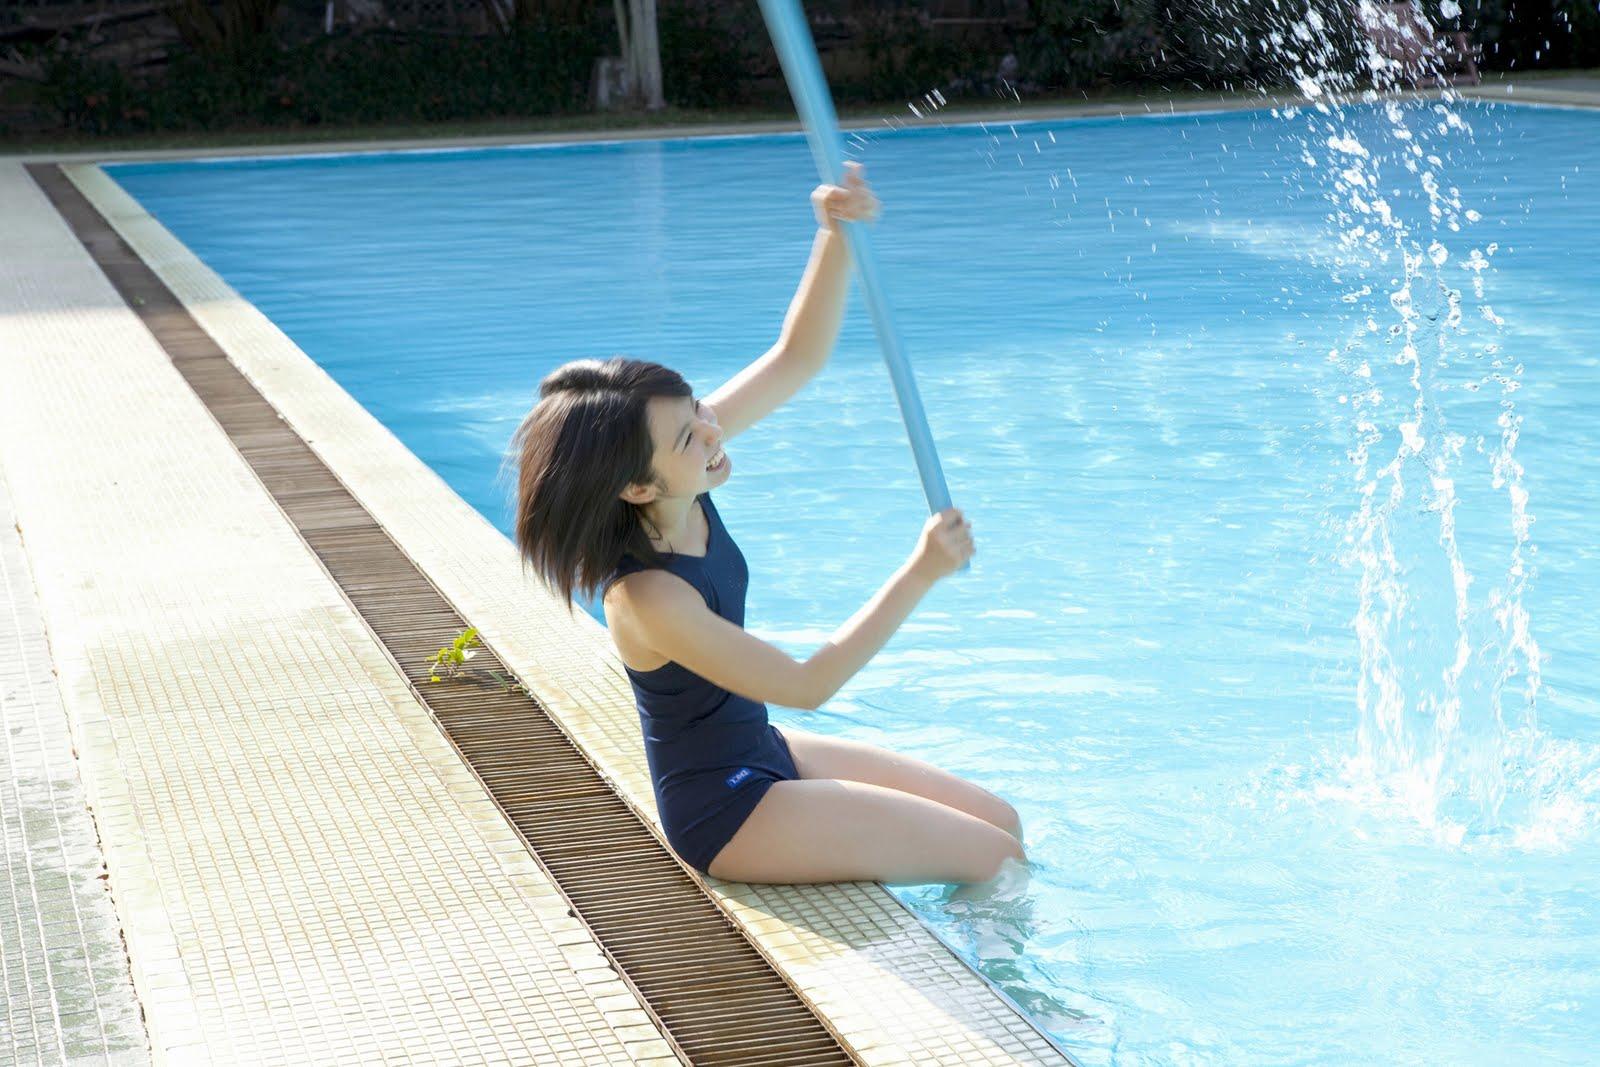 http://1.bp.blogspot.com/_mL74gvvafpo/TN9gUmbRN-I/AAAAAAAAJPQ/z6gdpxQmIro/s1600/Rina%252BKoike%252Bswimming%252Bpool%252Bcleaner04.jpg